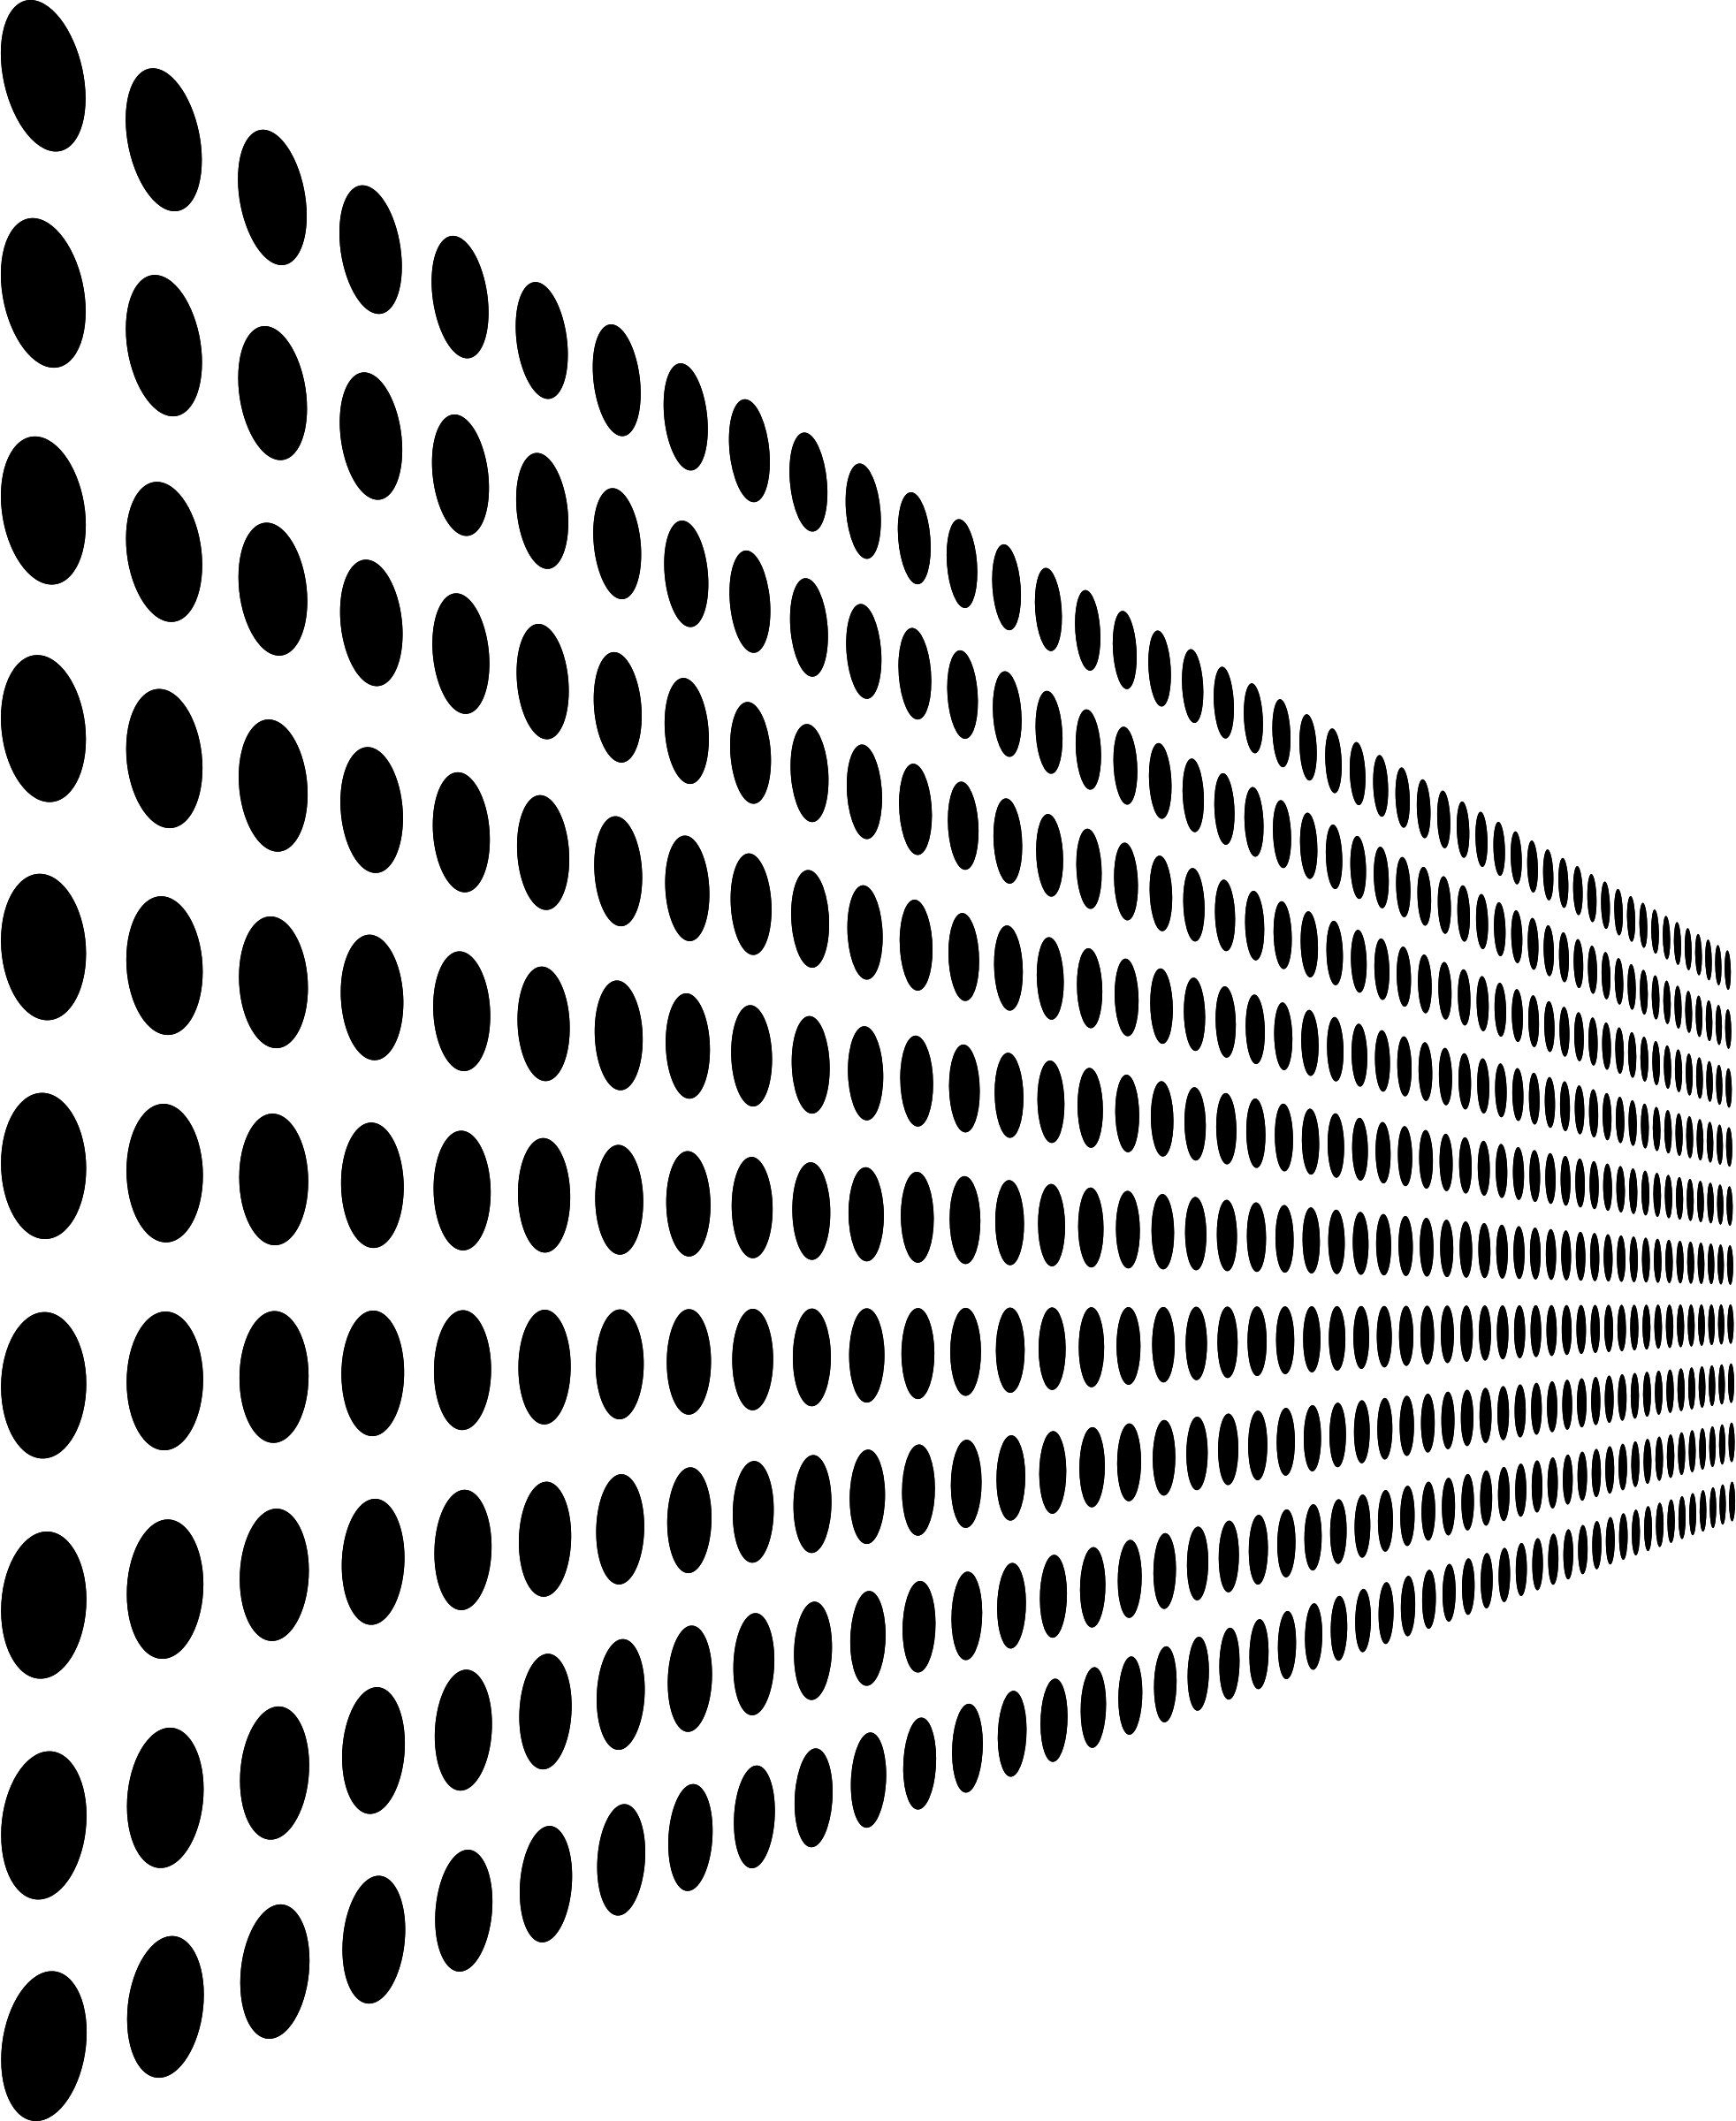 Ama Black Vector PNG - 107796